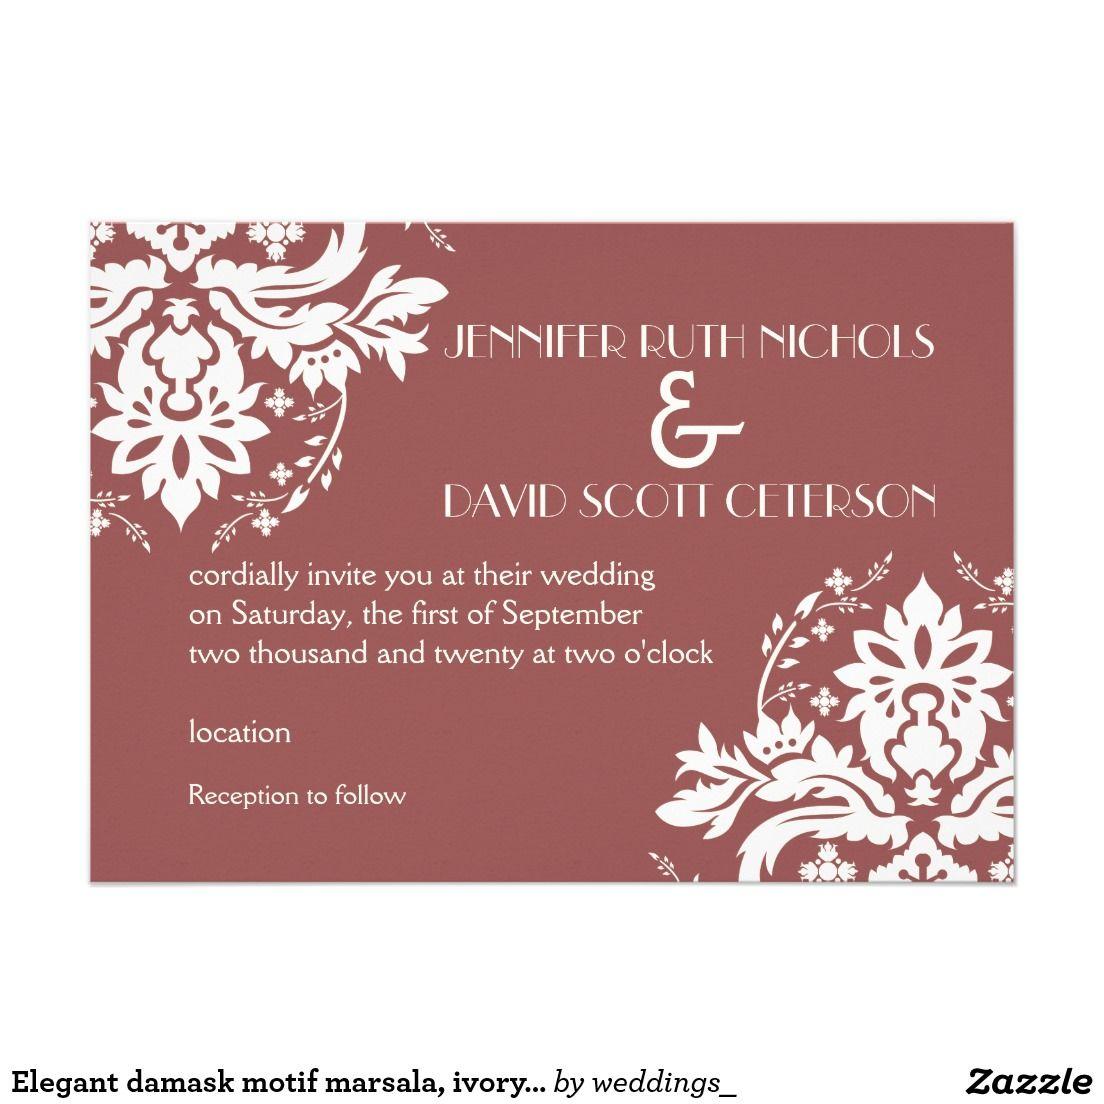 Elegant damask motif marsala, ivory wedding card